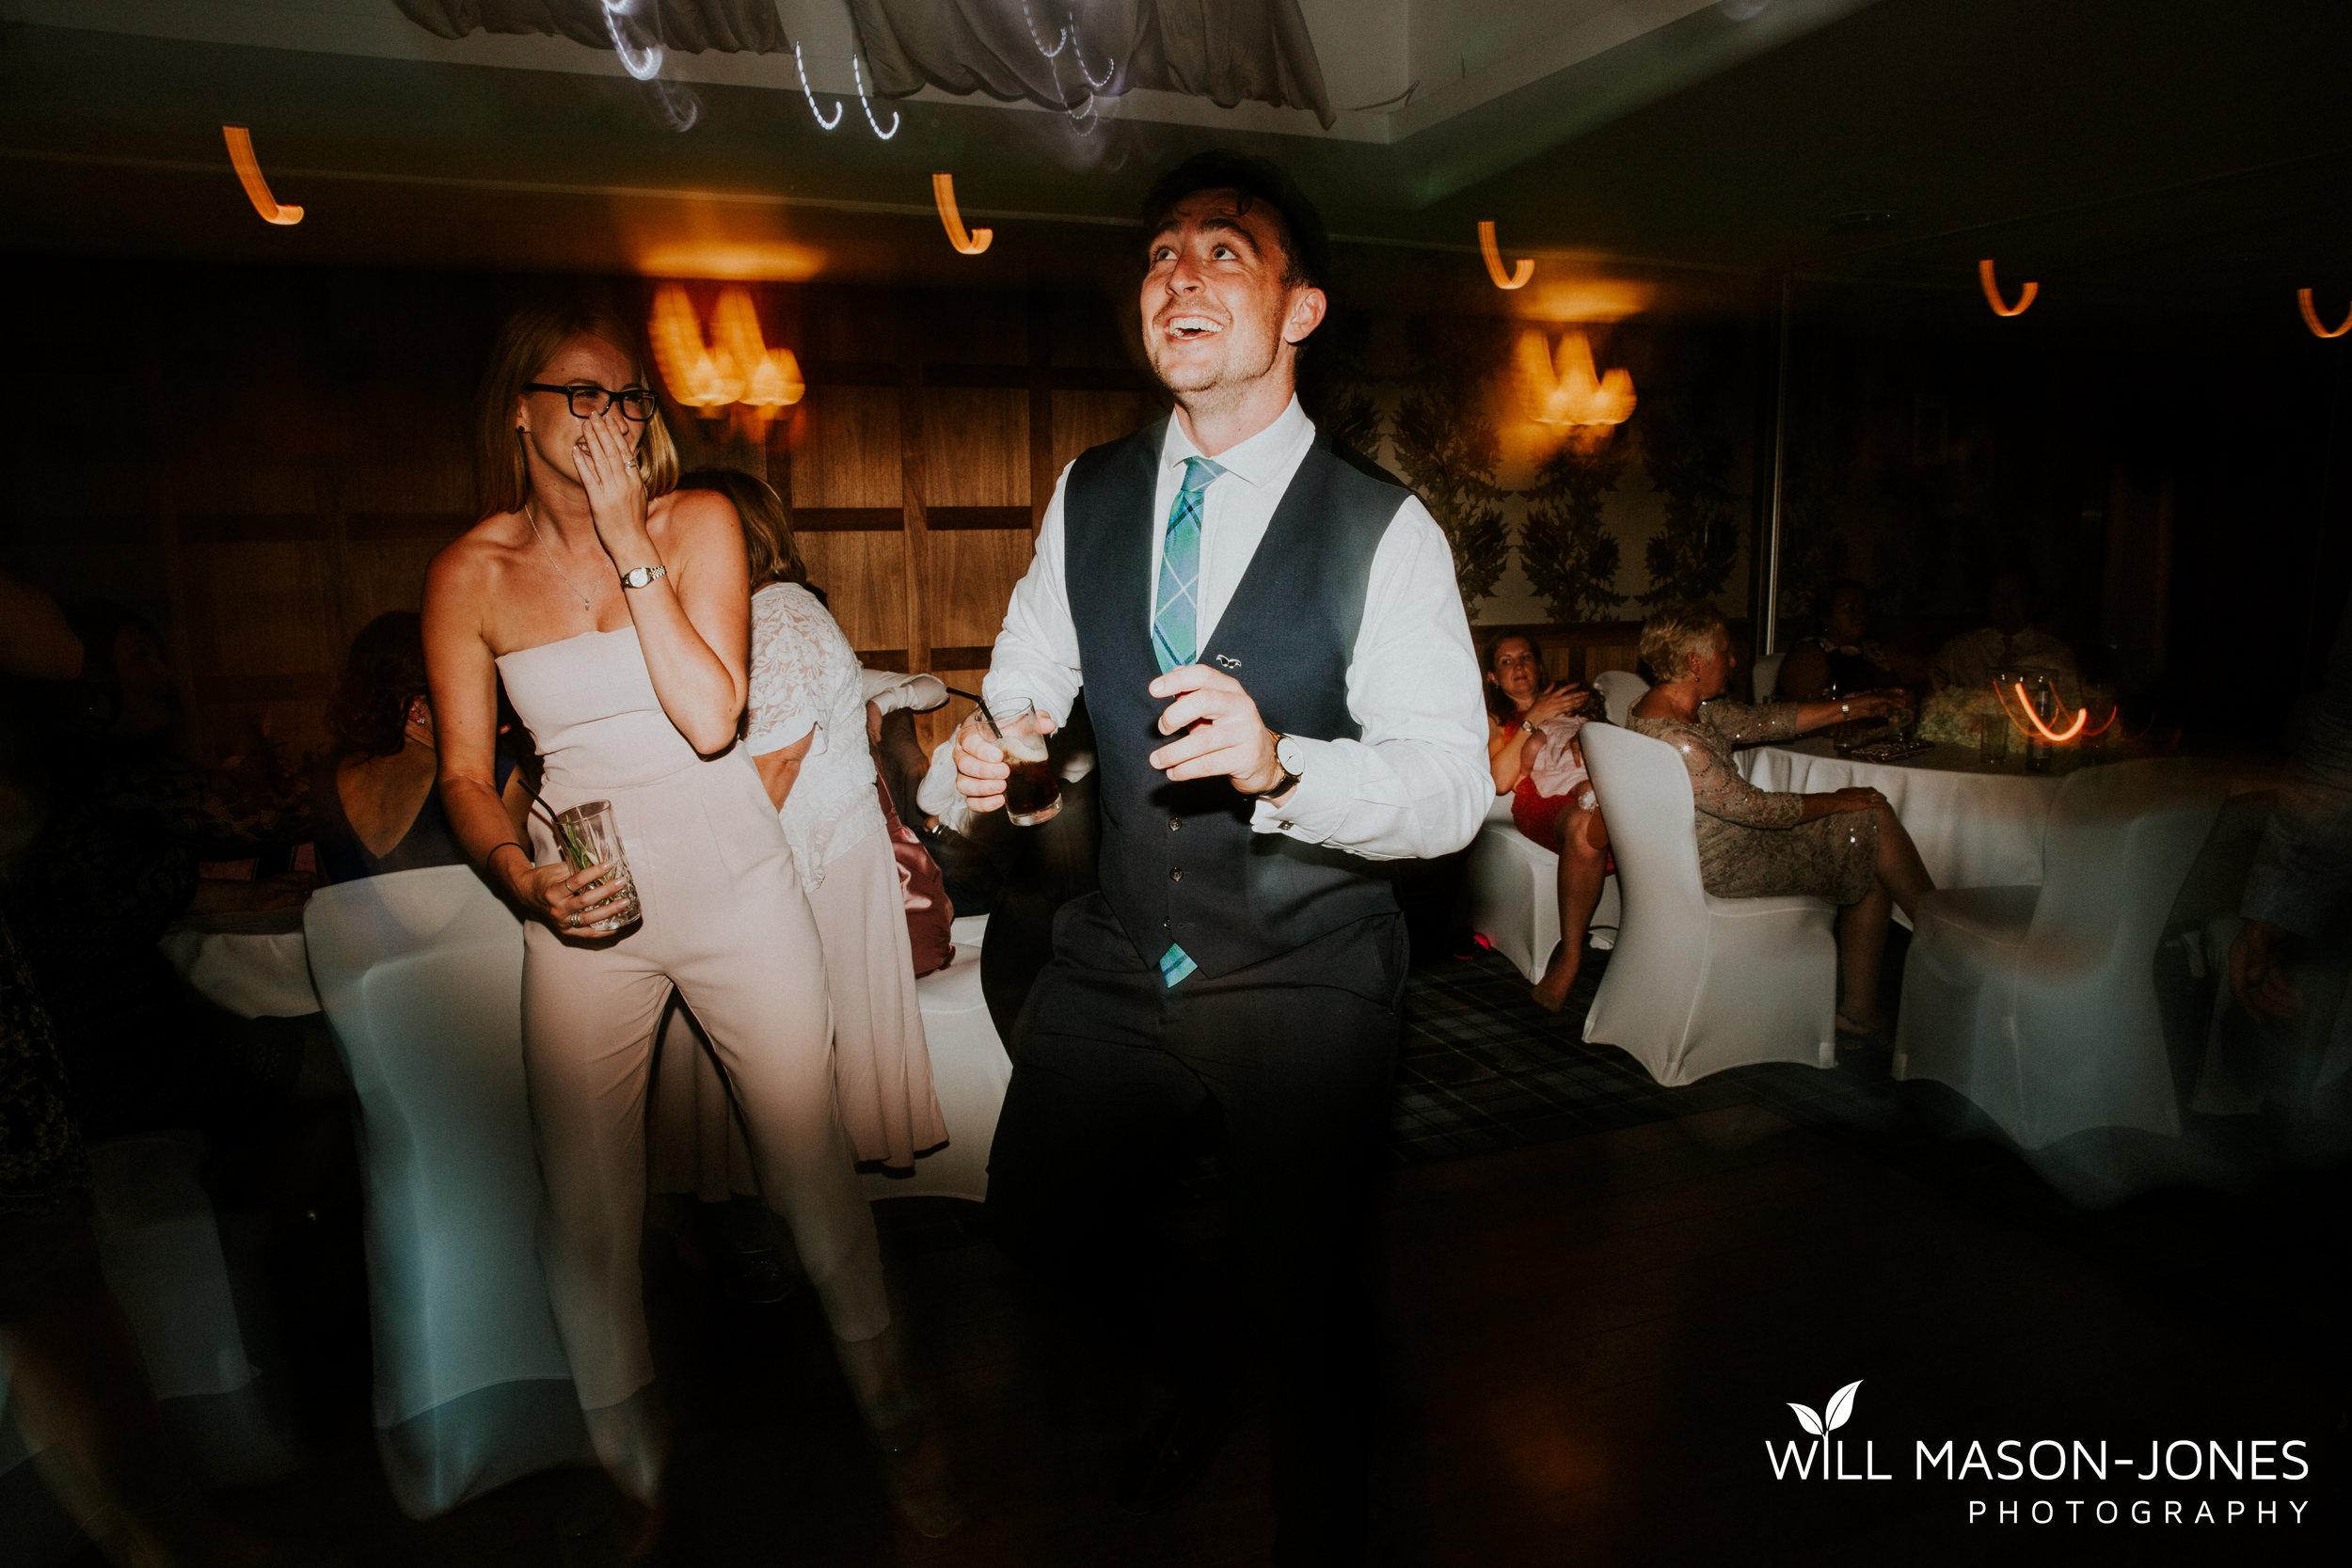 loch-lomond-destination-wedding-photographer-scotland-uk-wales-89.jpg